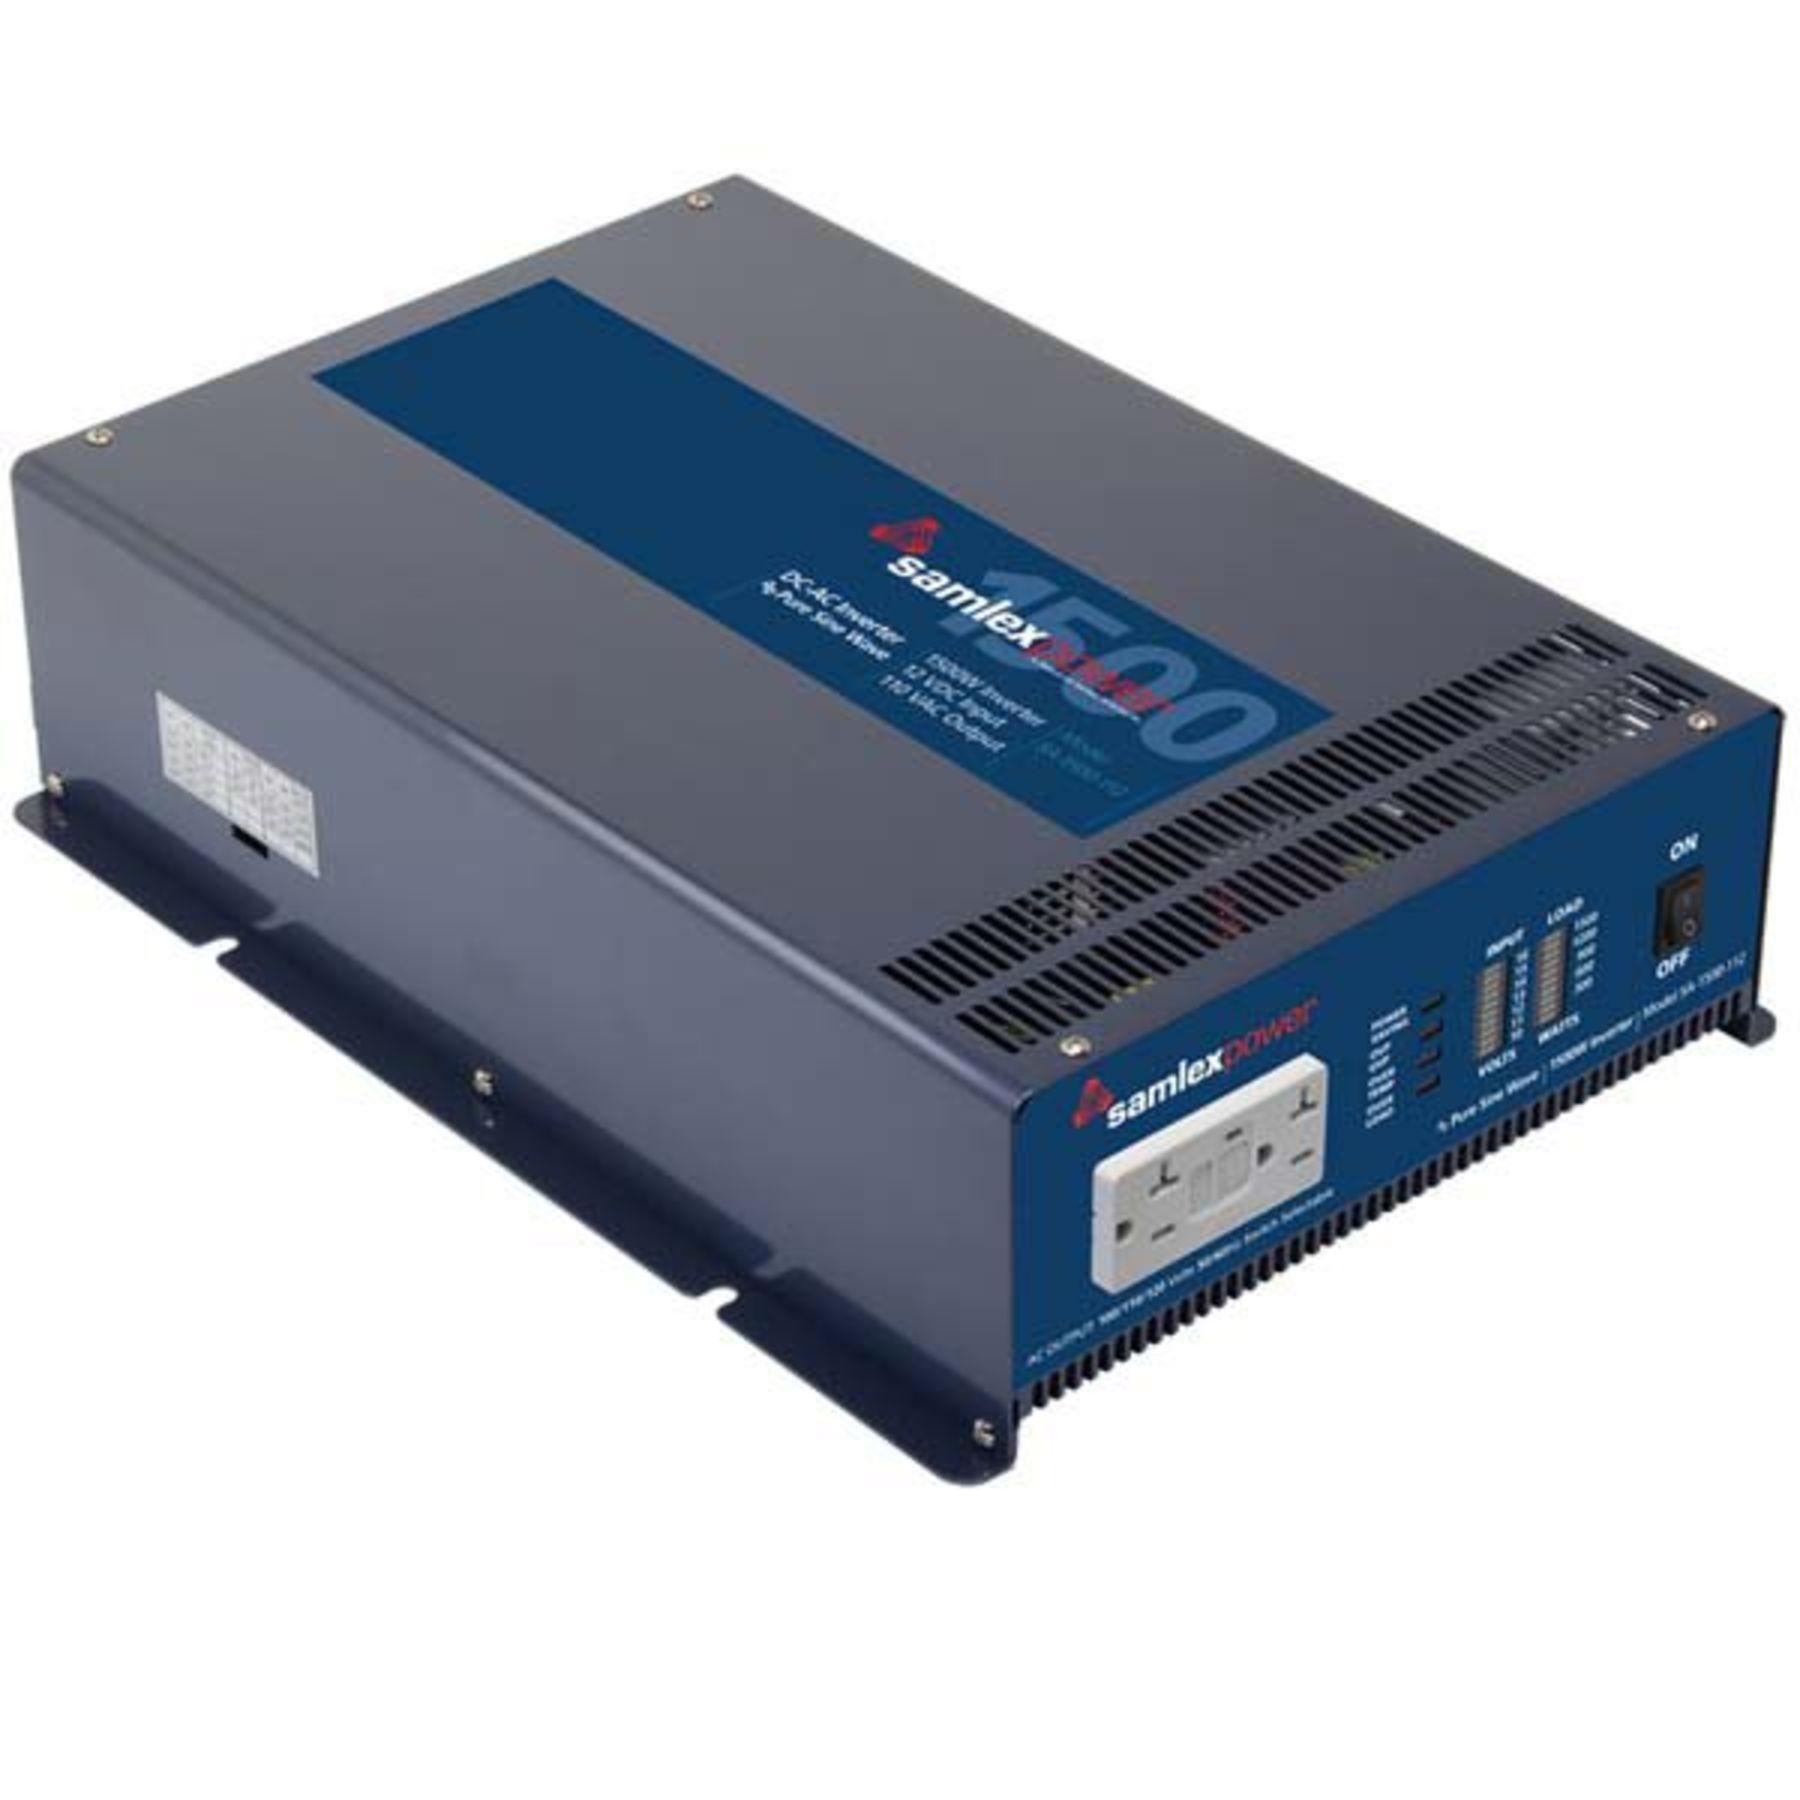 Sa 1500 112 Samlex 12v Watt Pure Sine Wave Inverter 12 Vdc To 120 Vac Circuit